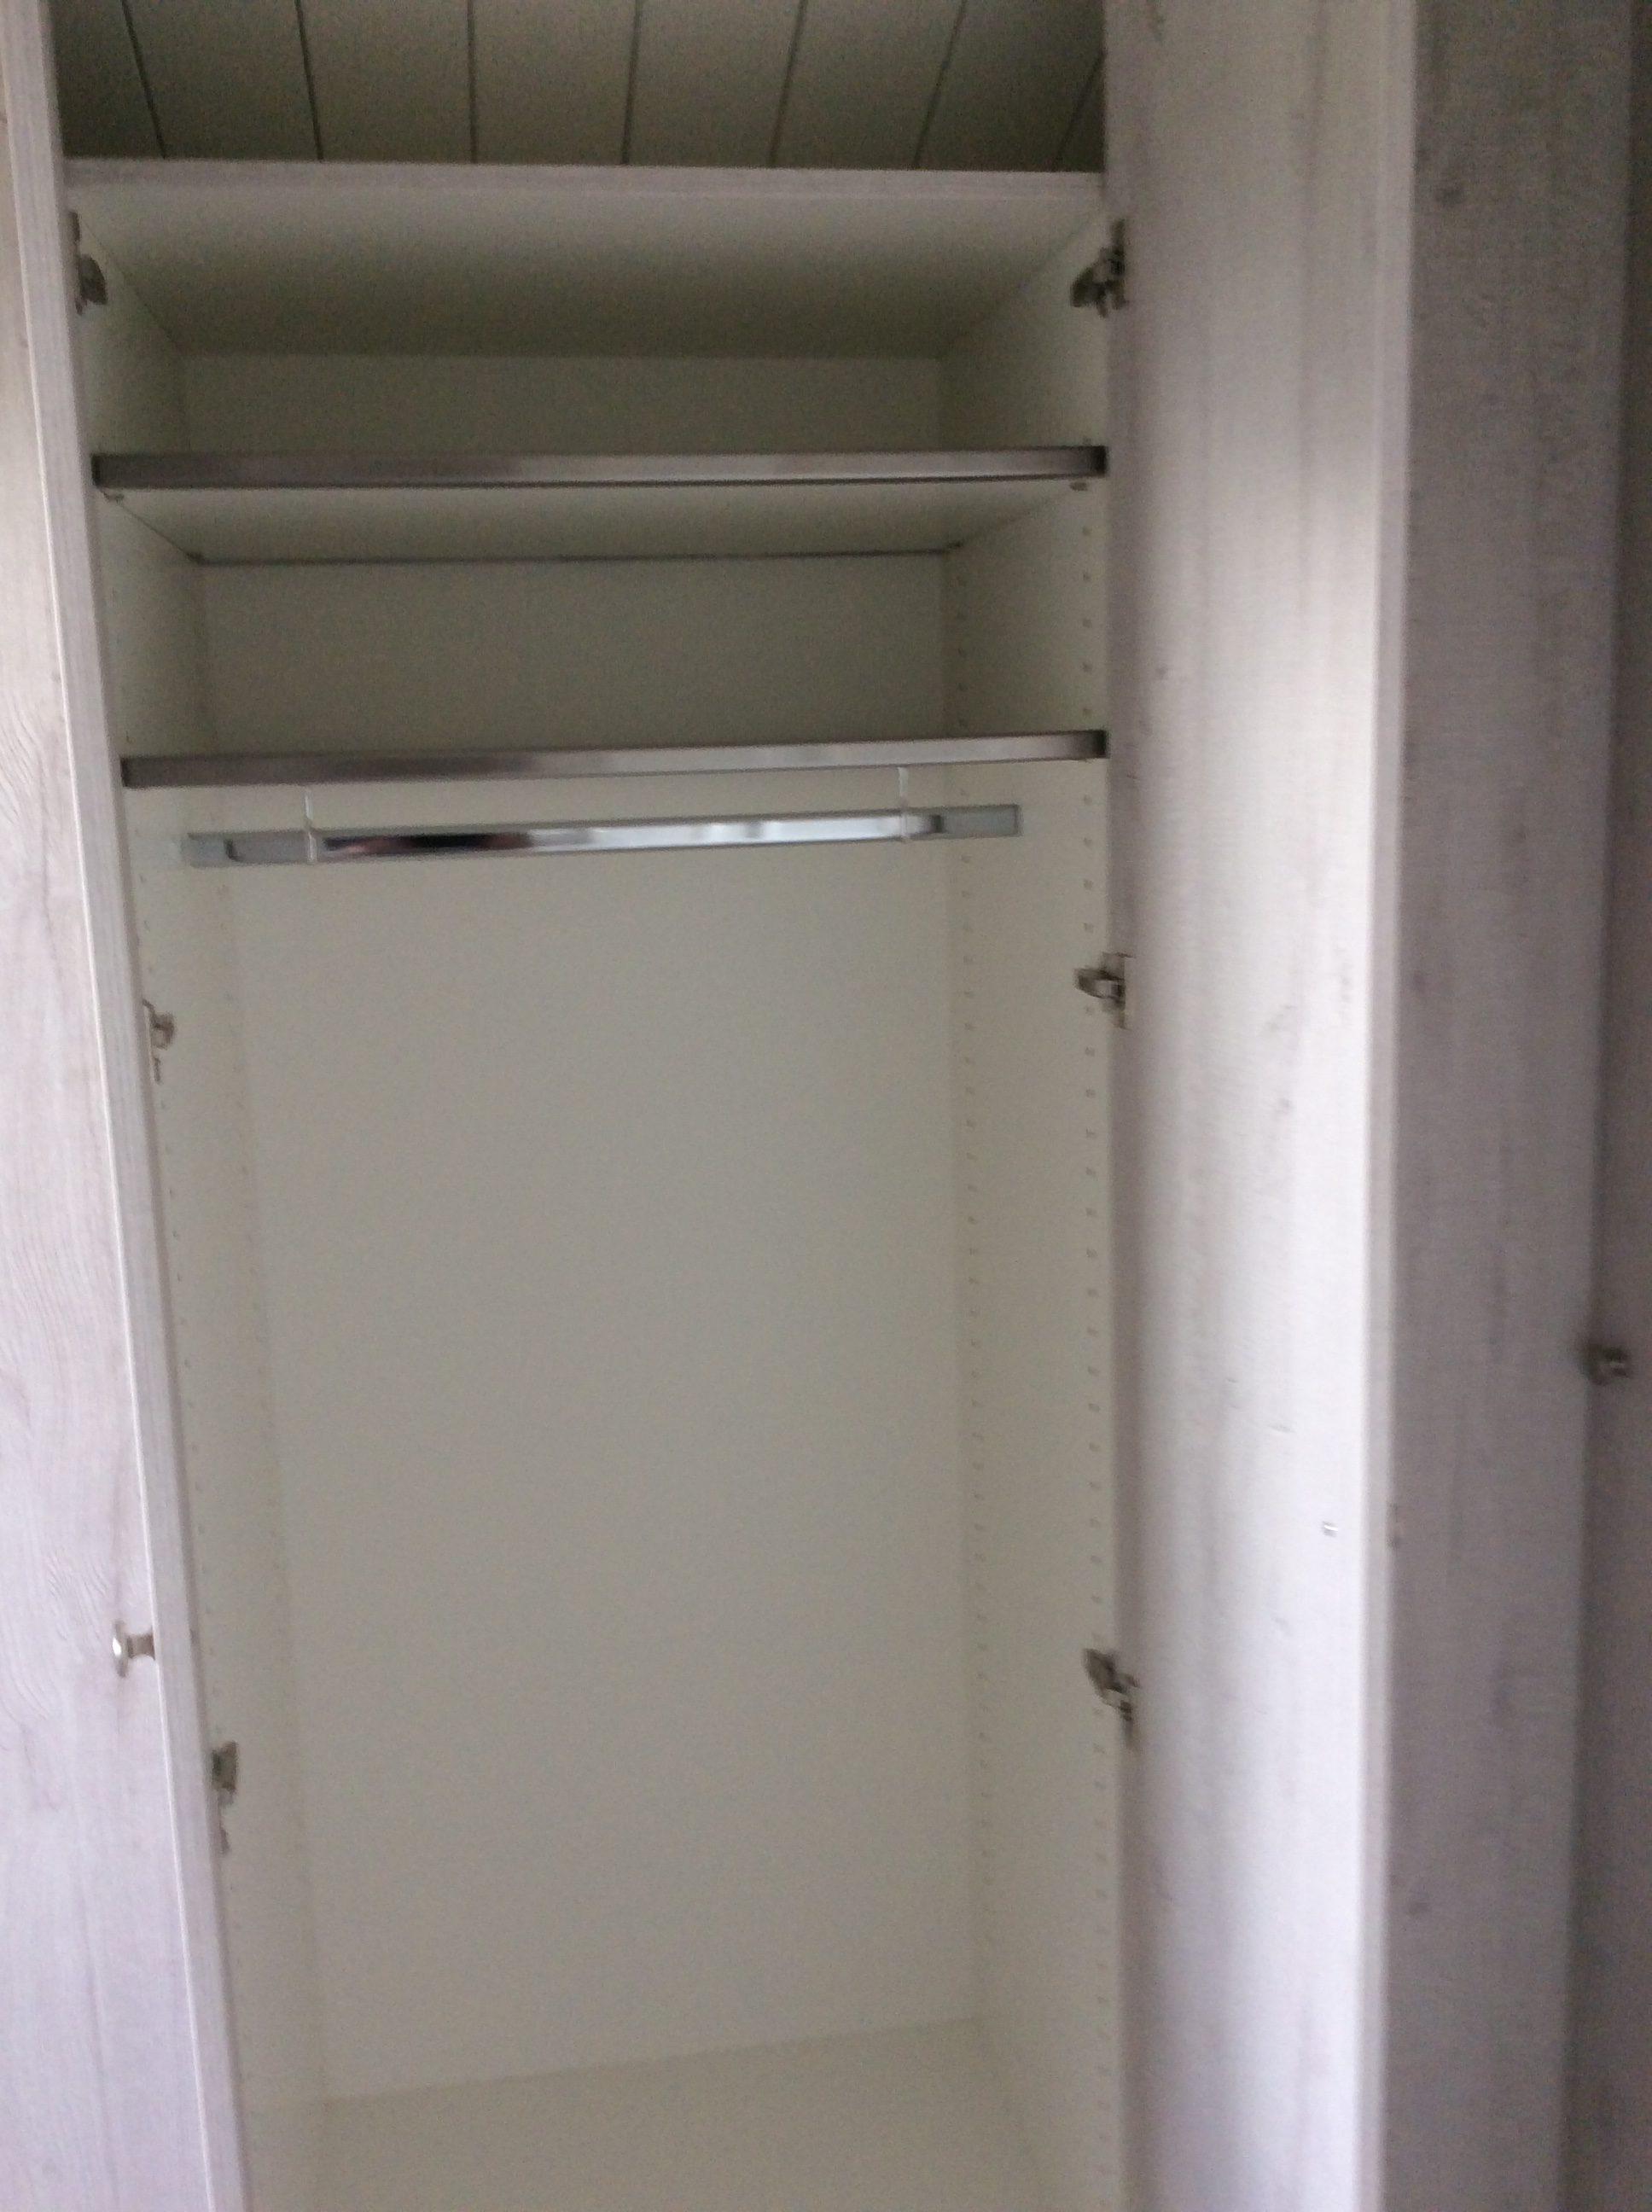 agencement de placard sur mesure finest gallery of placard ikea chambre collection avec ikea. Black Bedroom Furniture Sets. Home Design Ideas